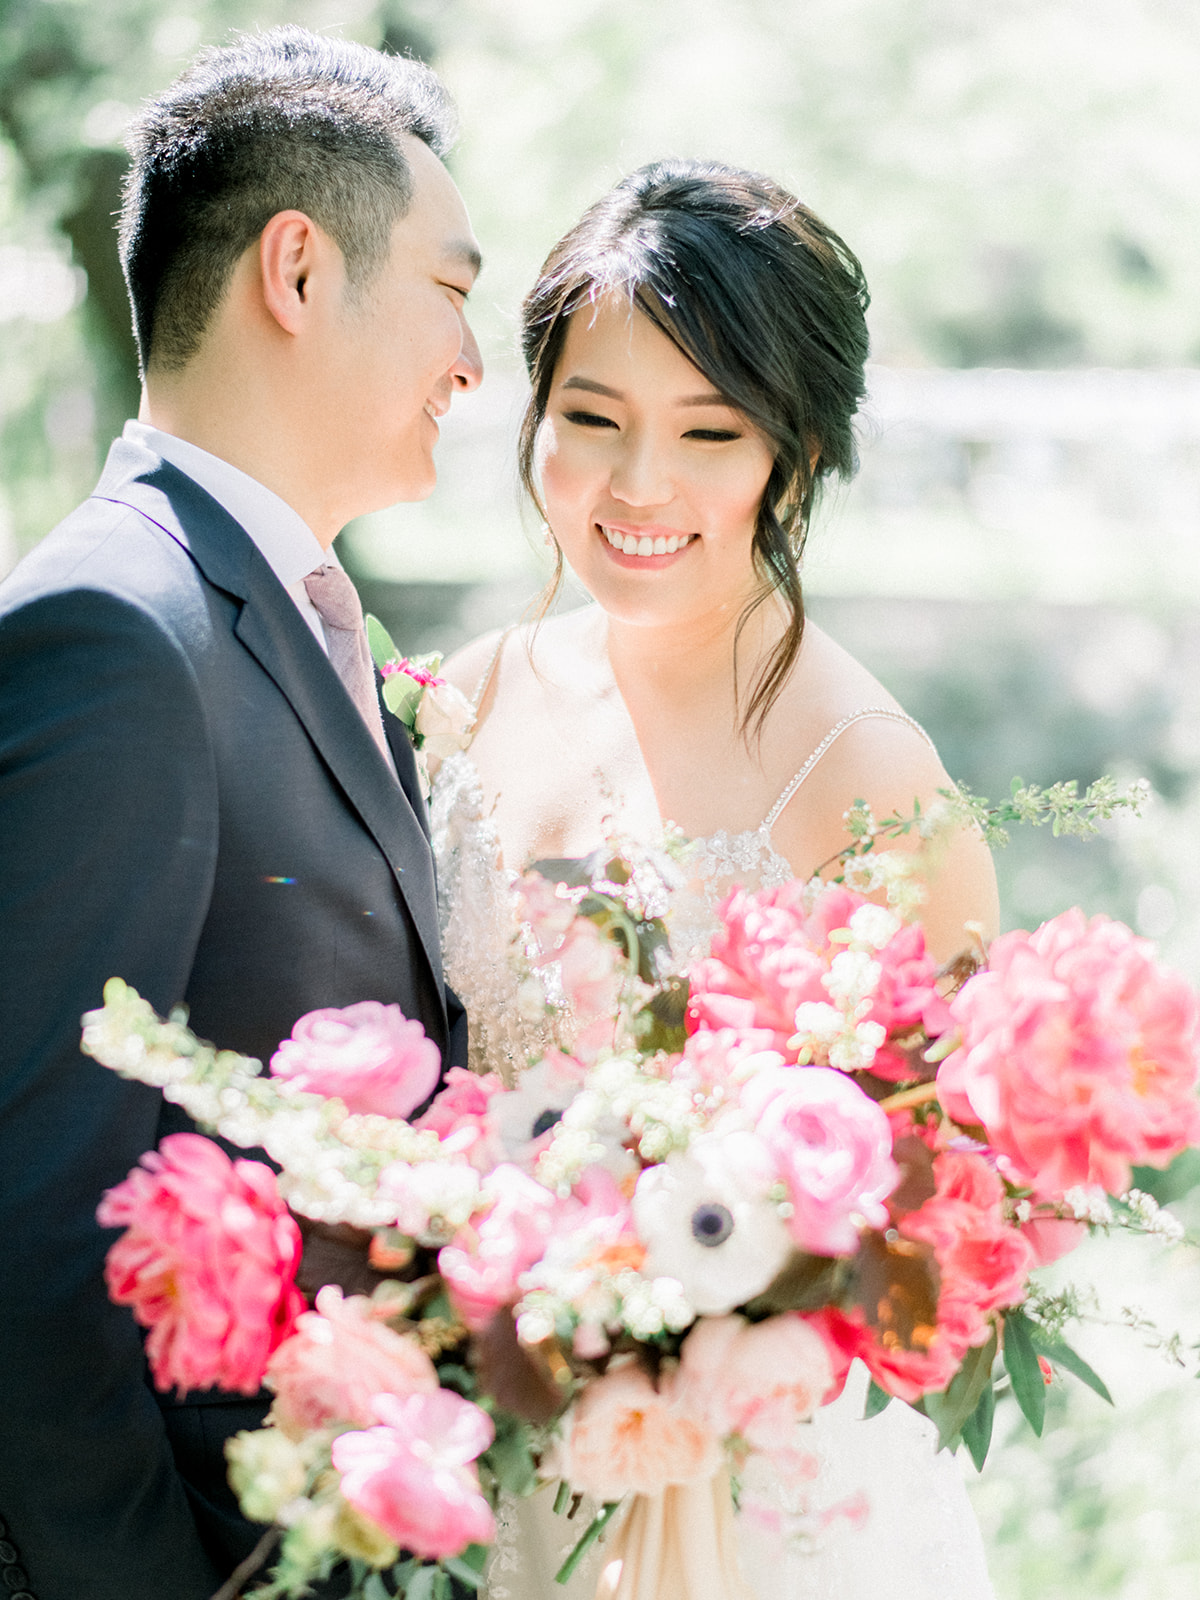 jueunandjon-etherandsmith-wedding-295.jpg